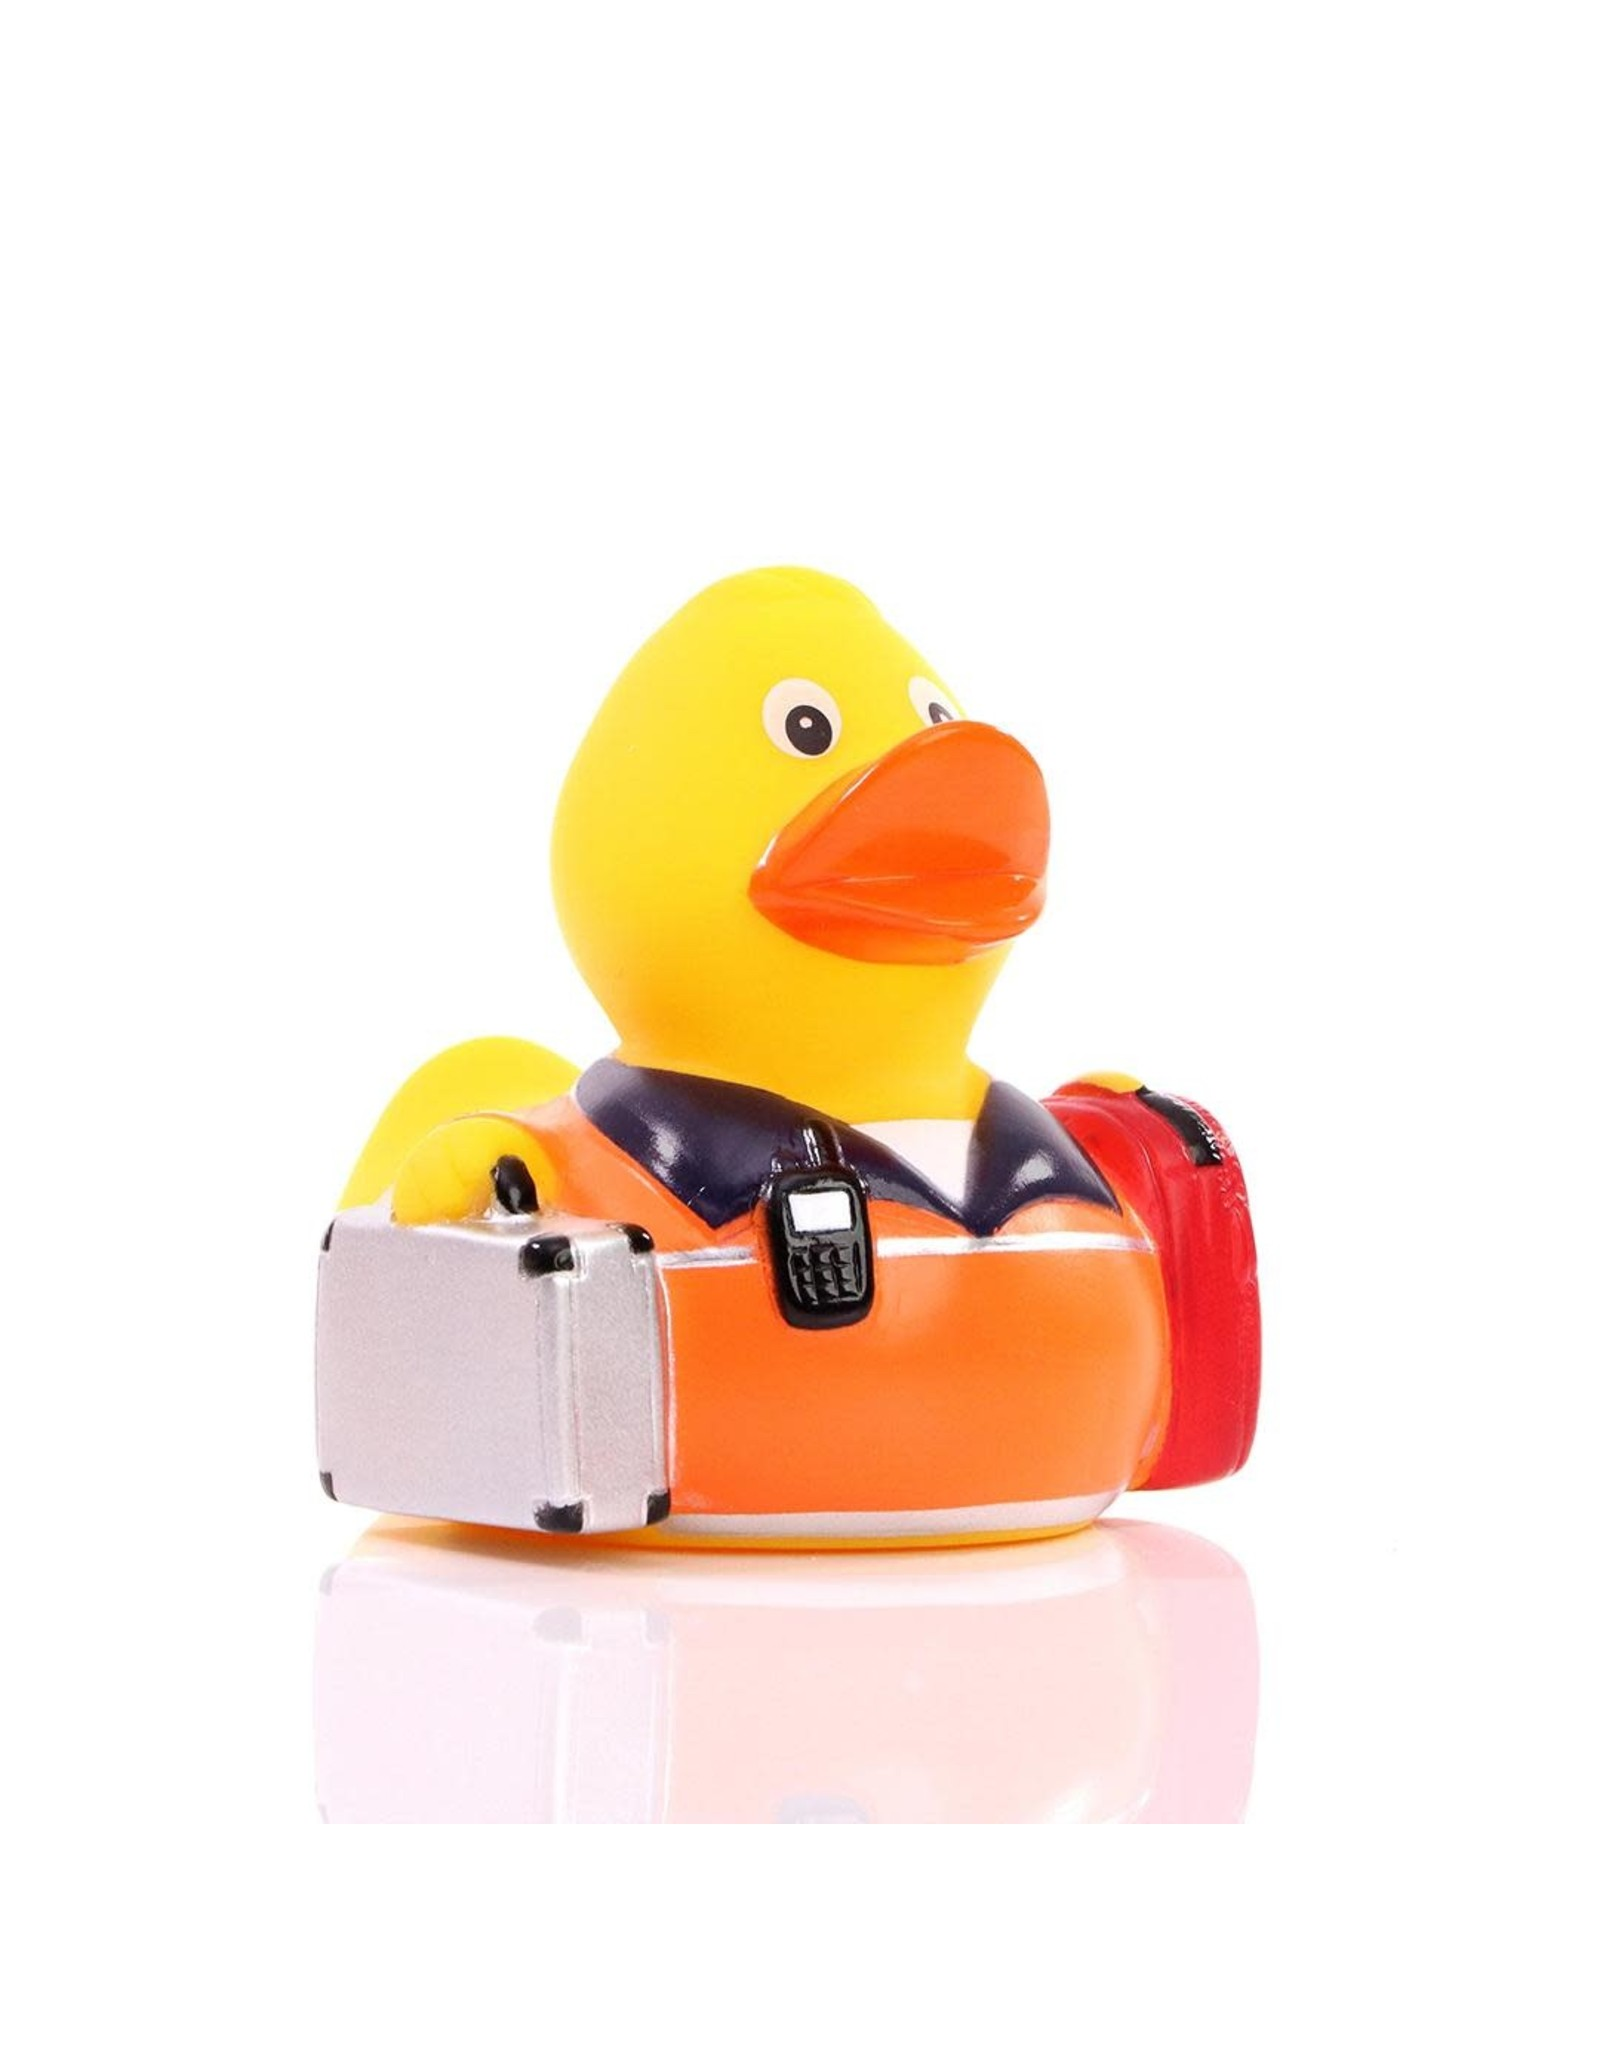 Paramedic Rubber Duck